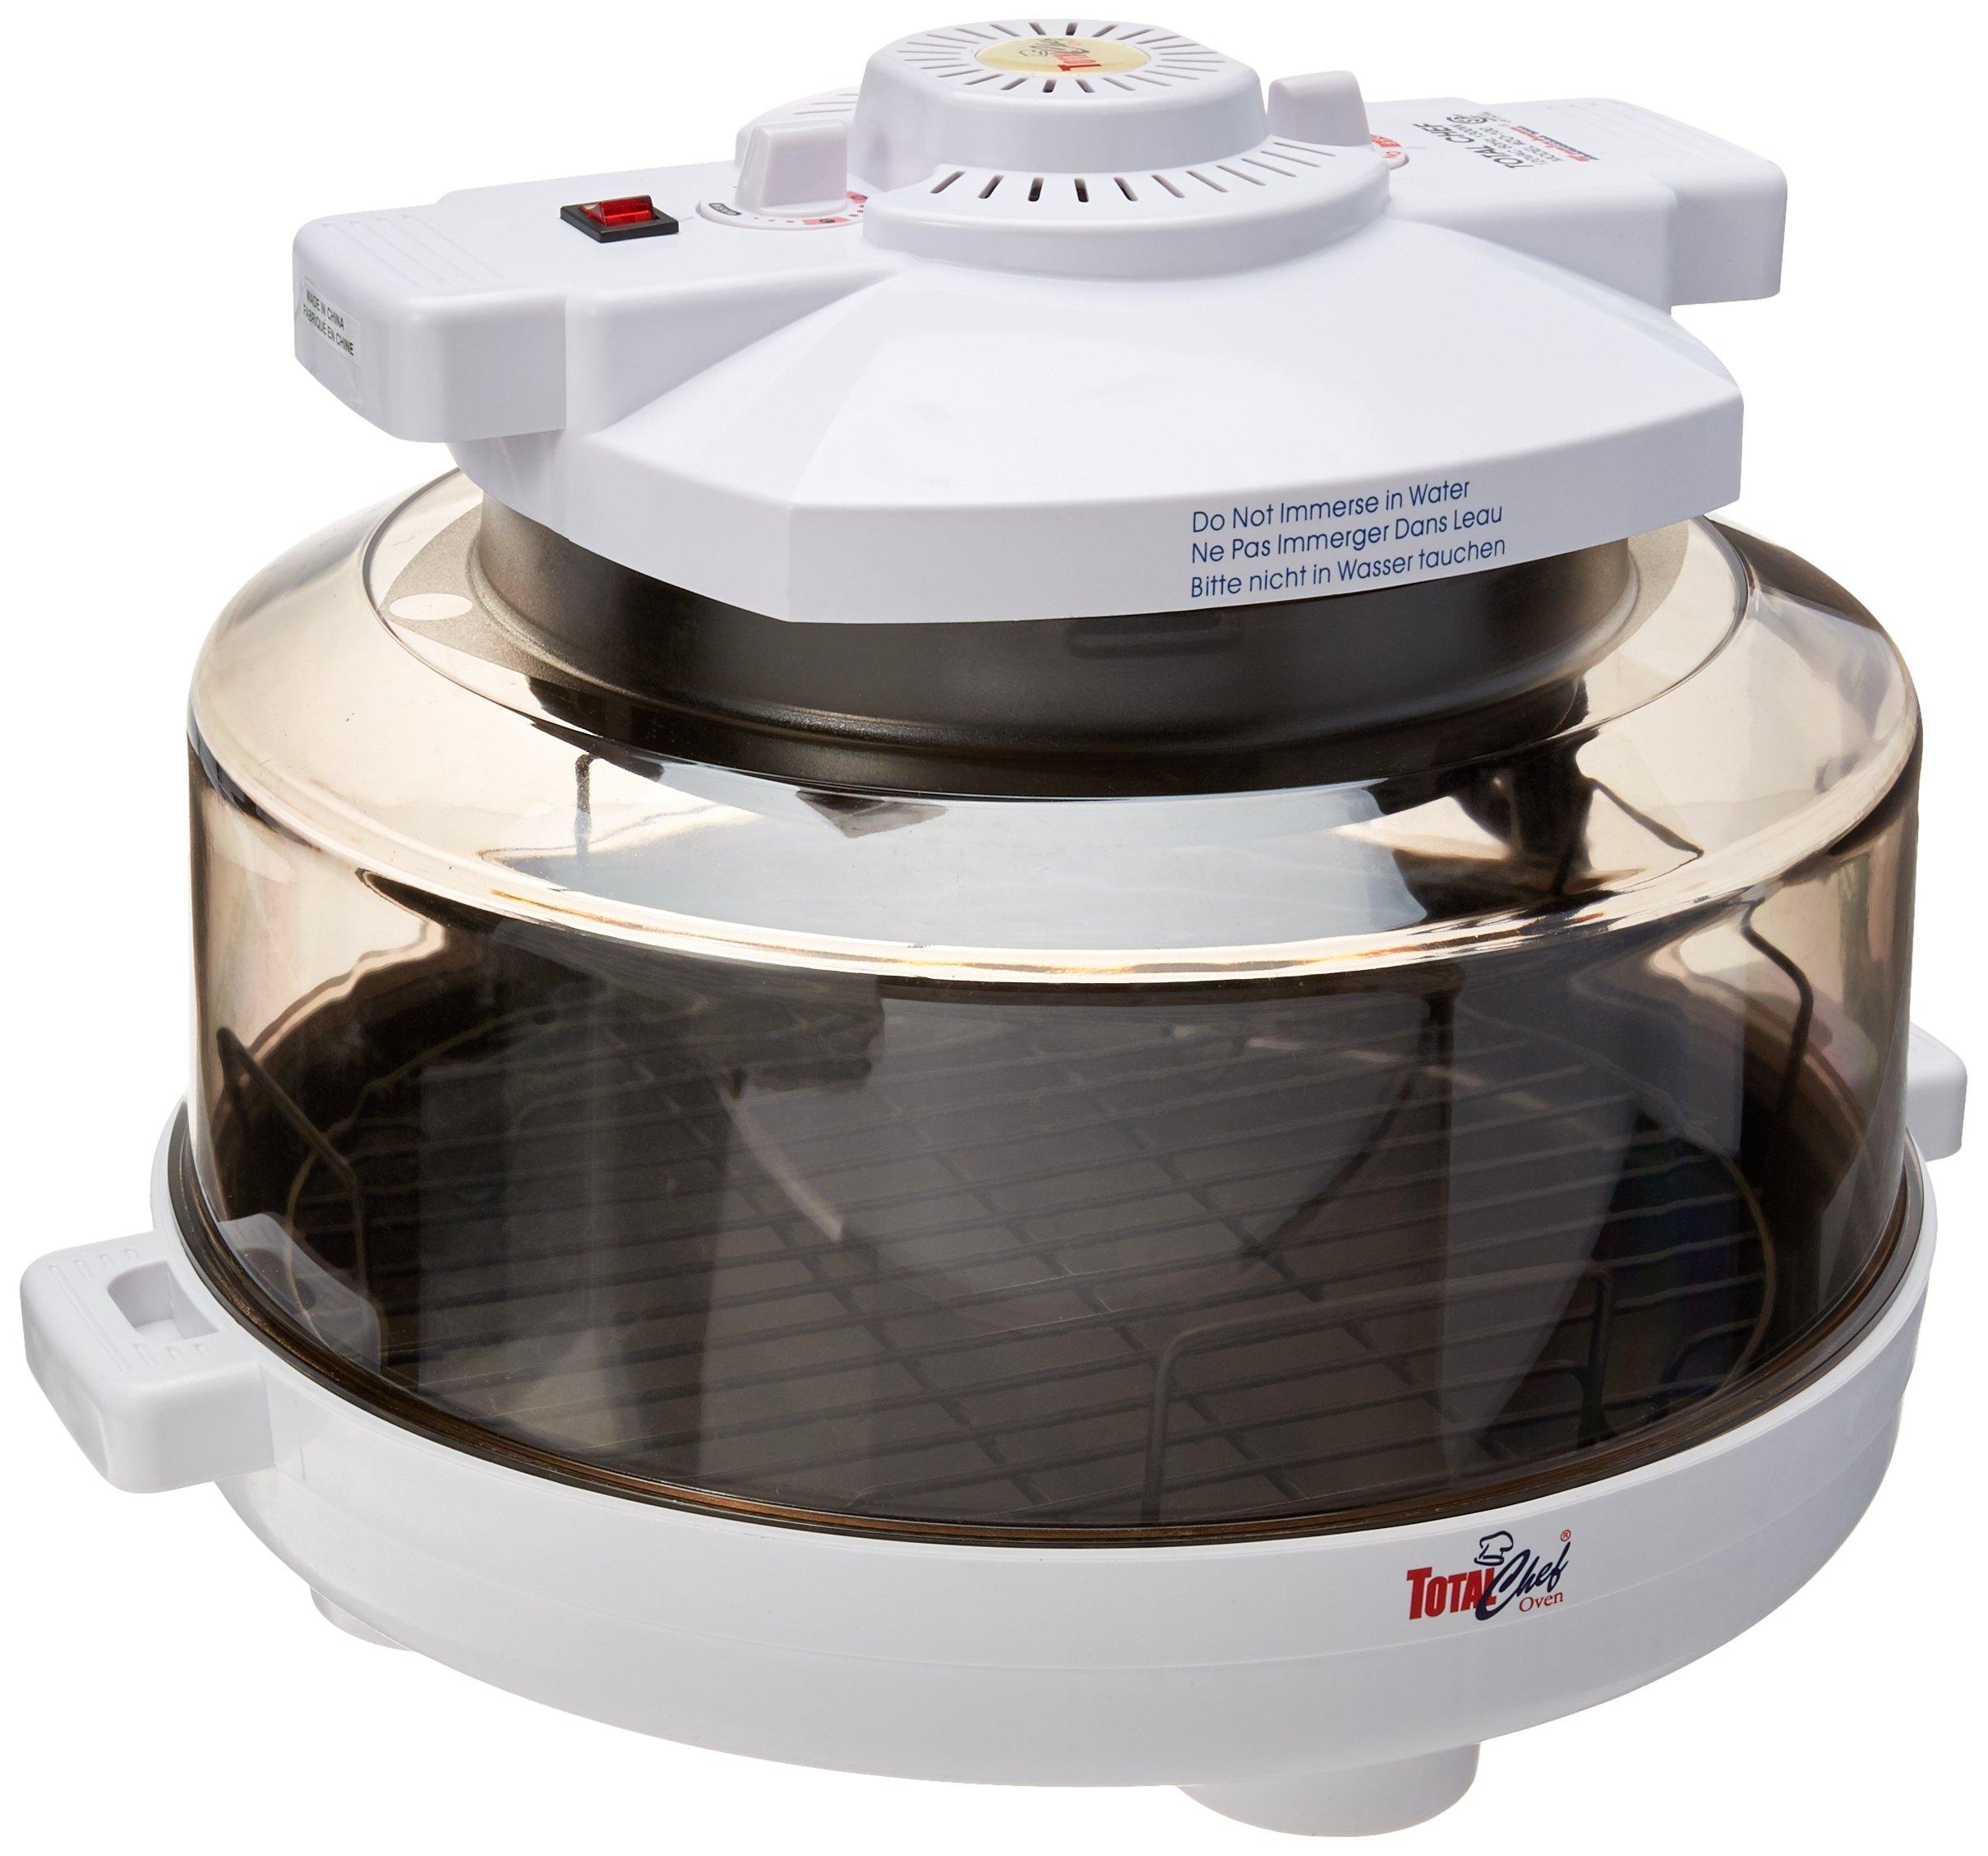 Koolatron Z100B Total Chef Oven